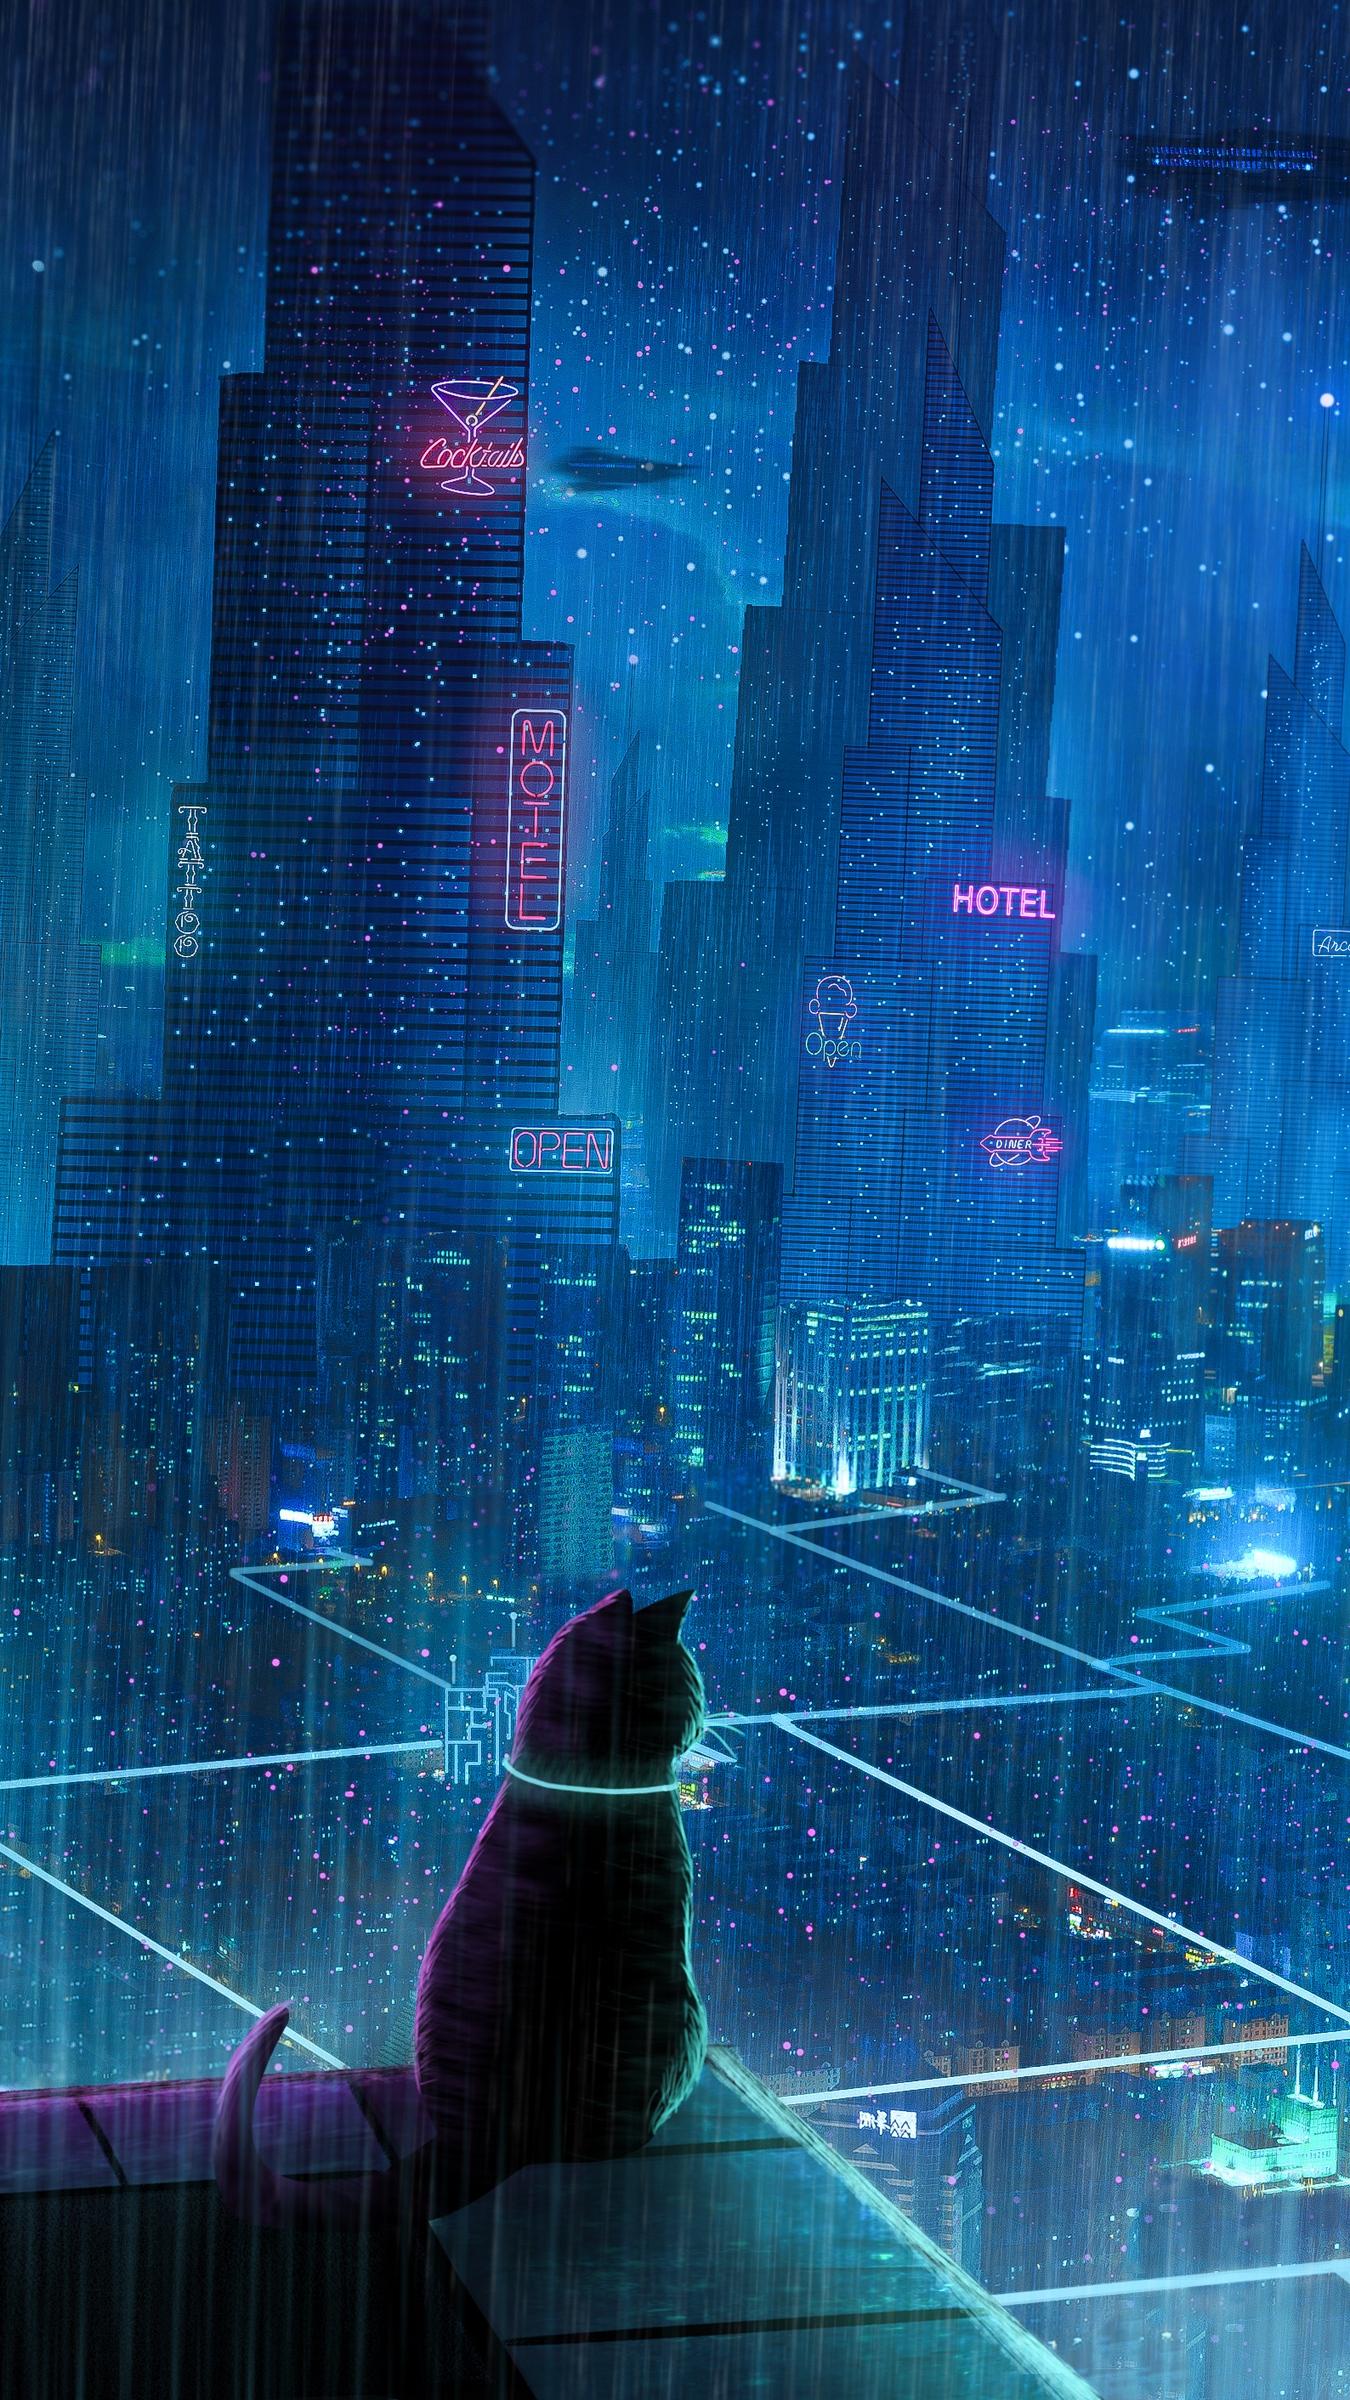 Wallpaper Digital Art Building Cityscape Skyscraper Portrait Display Neon Vertical Cats Rain Cyberpunk Hotel 1350x2400 Zenome 1838165 Hd Wallpapers Wallhere